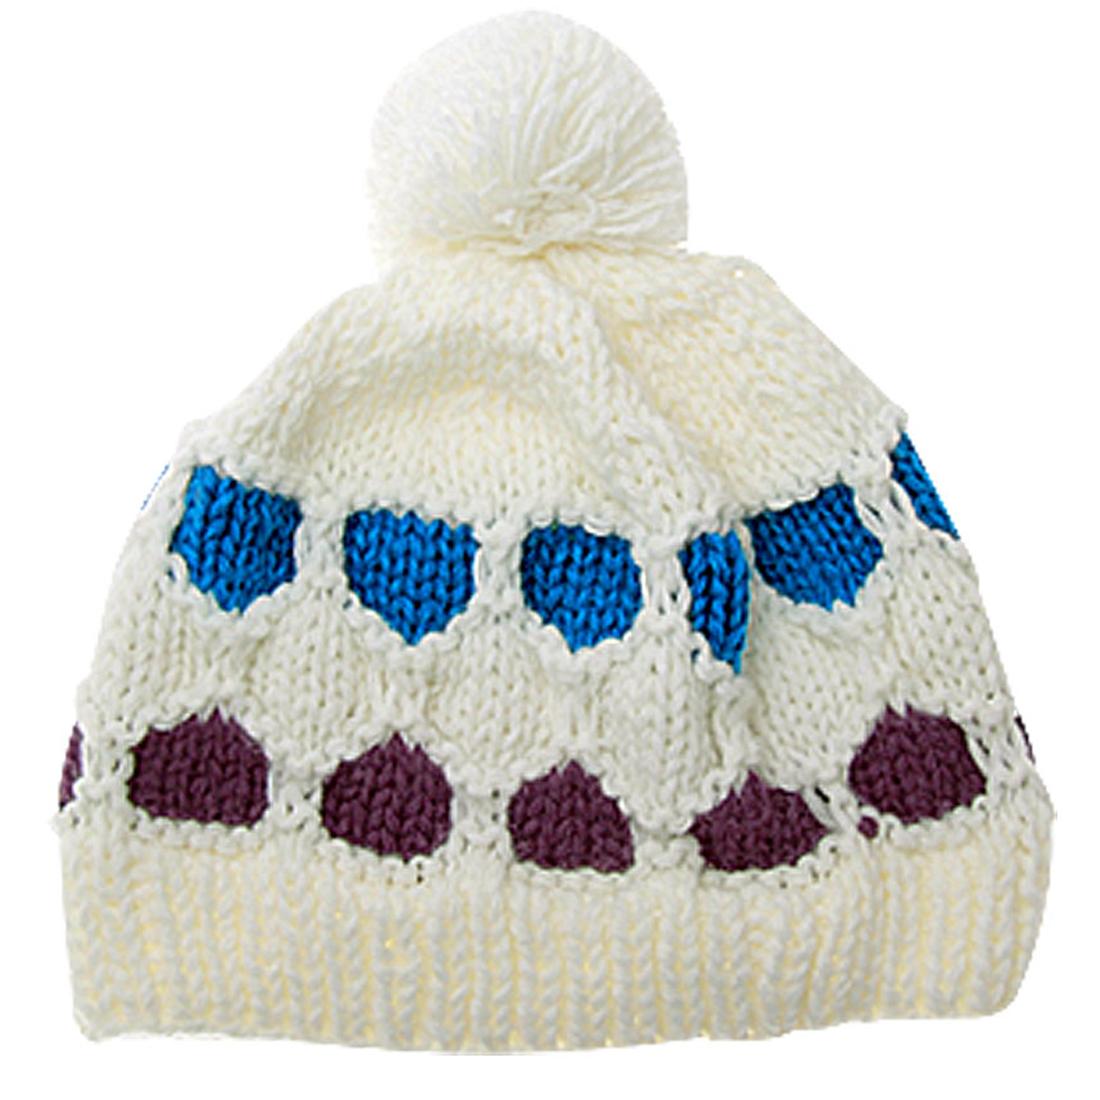 Ladies Crochet Knit Pom Pom Skull Cap Warm Beanie Hat Qpurn